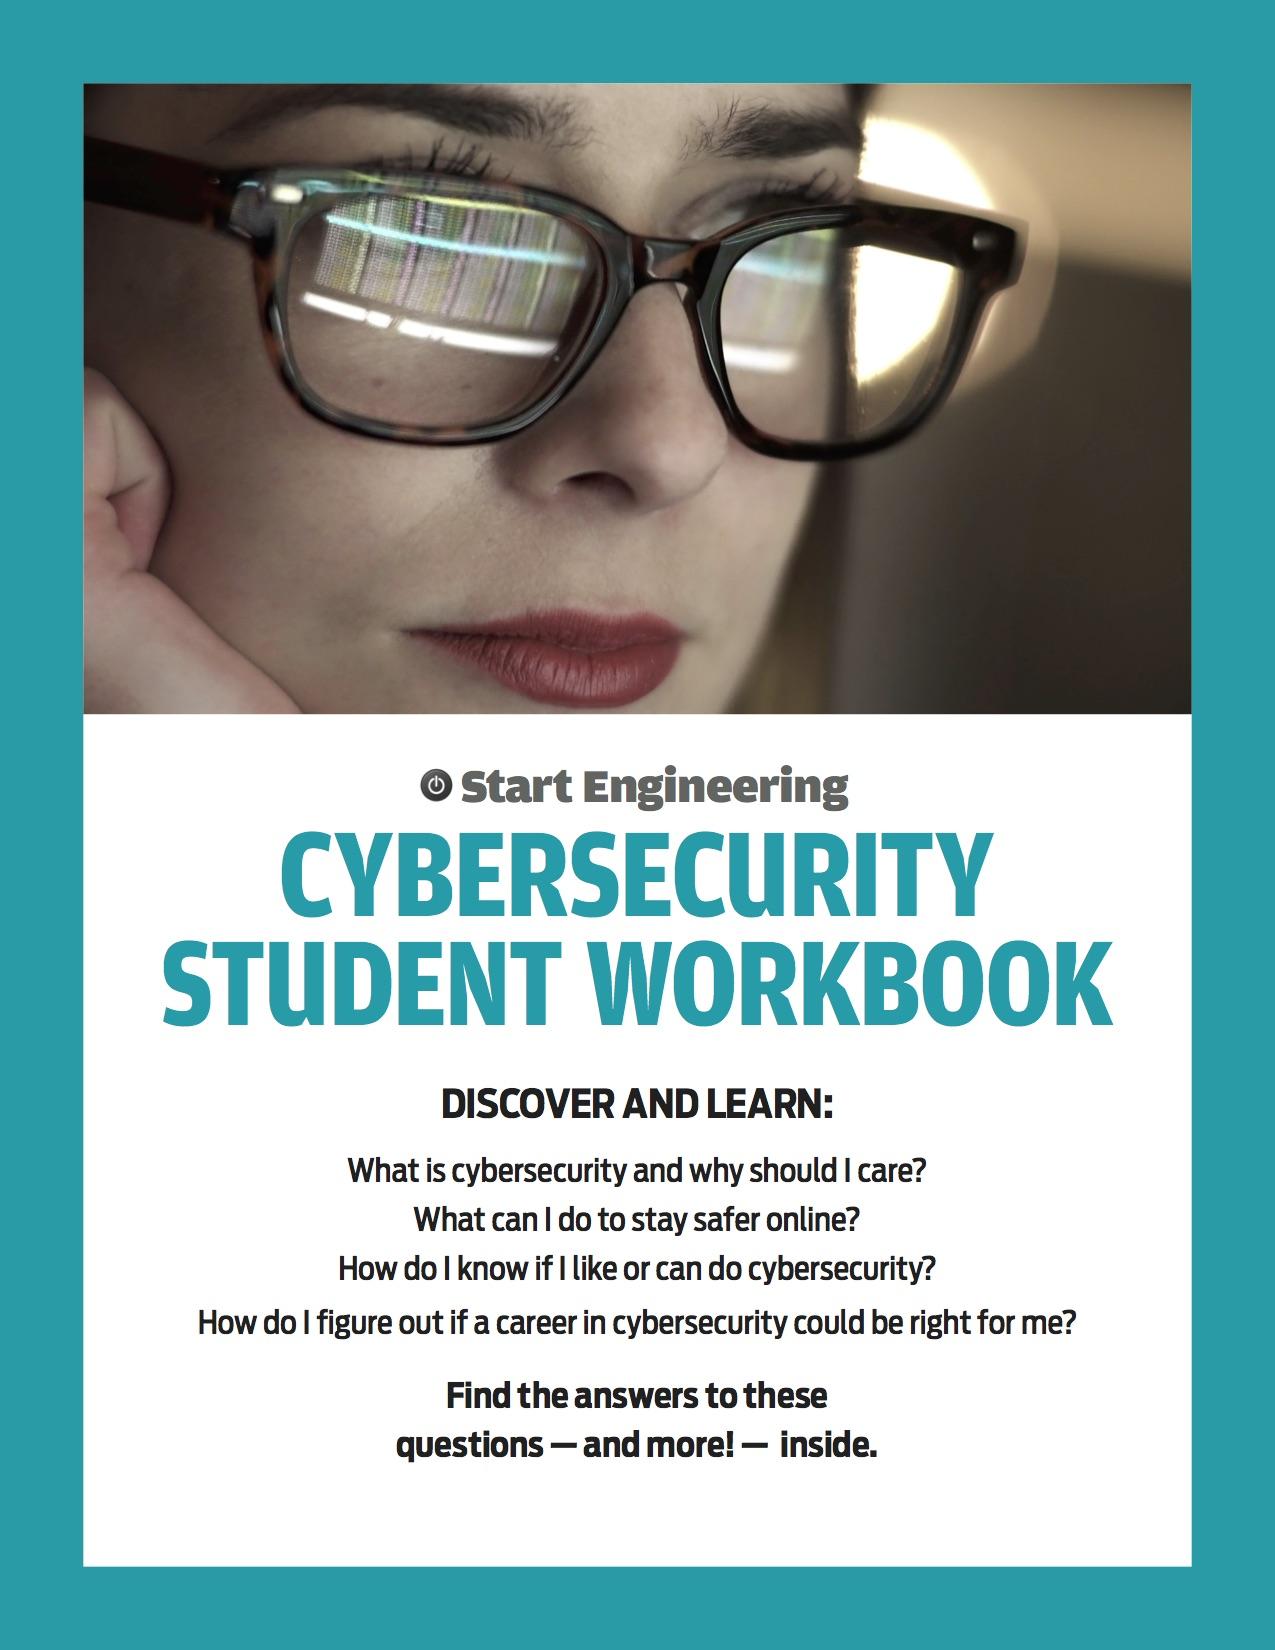 Cybersecurity Student Workbook cover.jpg